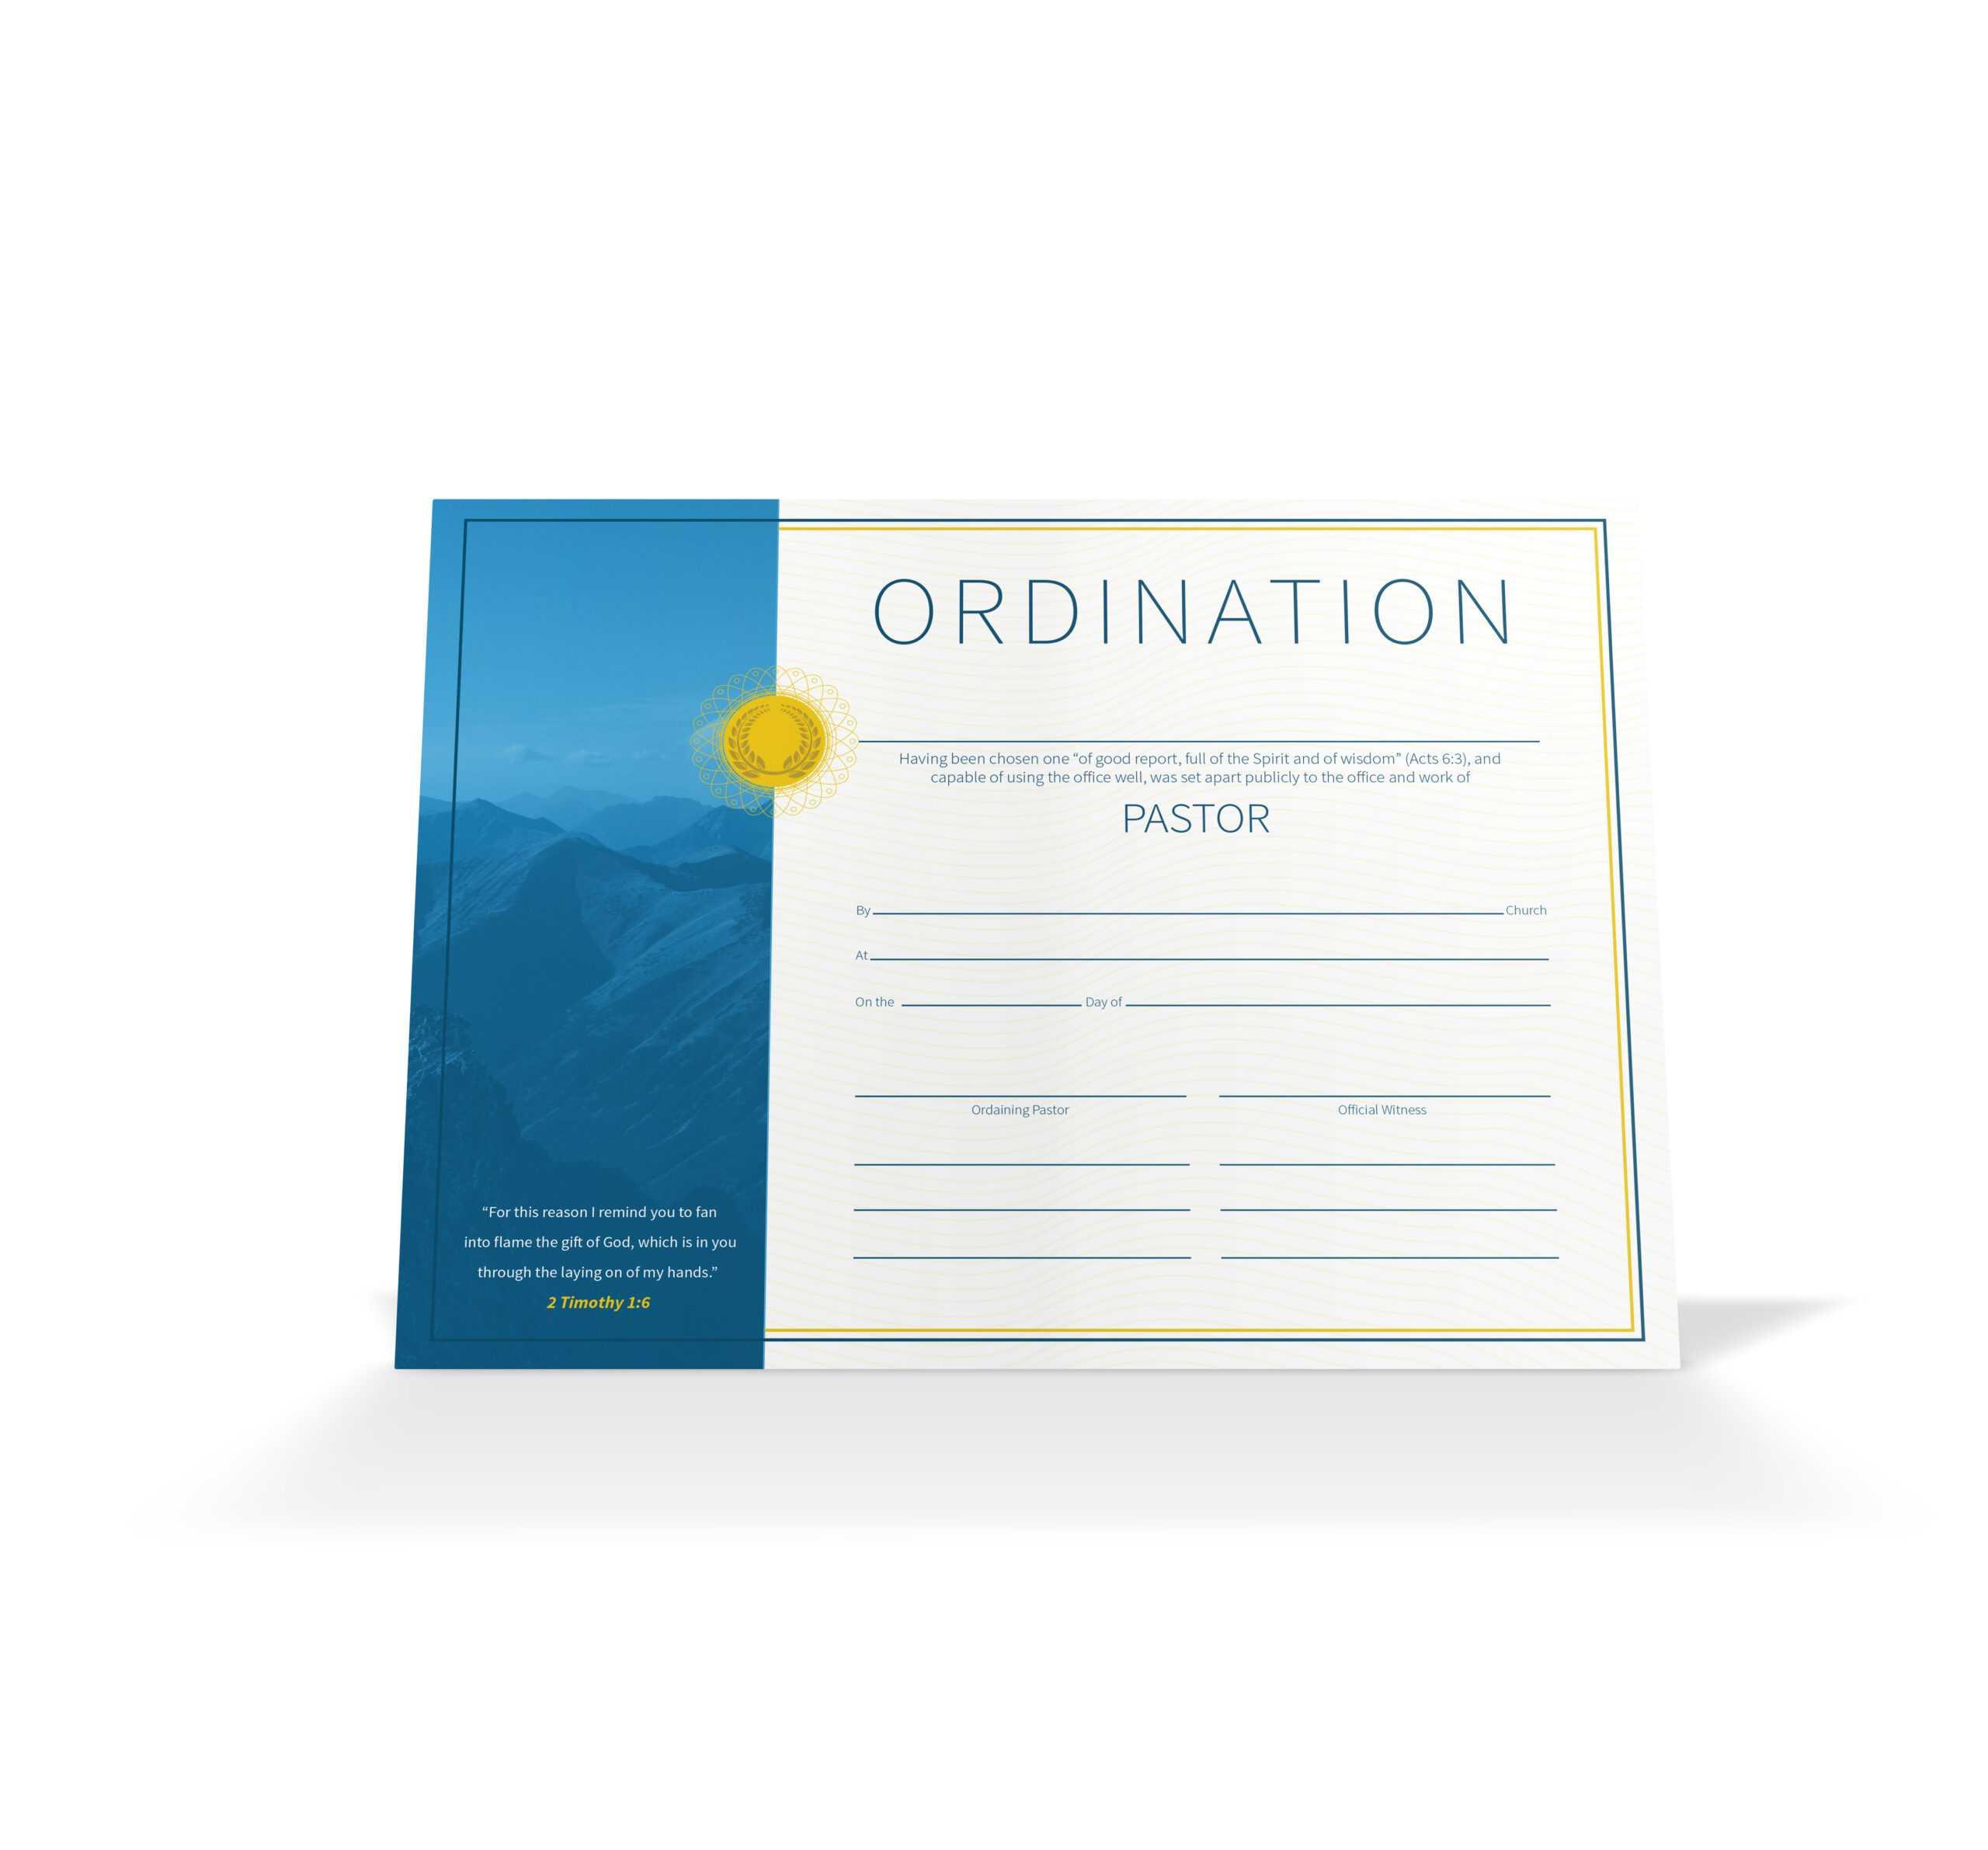 Pastor Ordination Certificate – Vineyard Digital Membership Pertaining To Ordination Certificate Templates